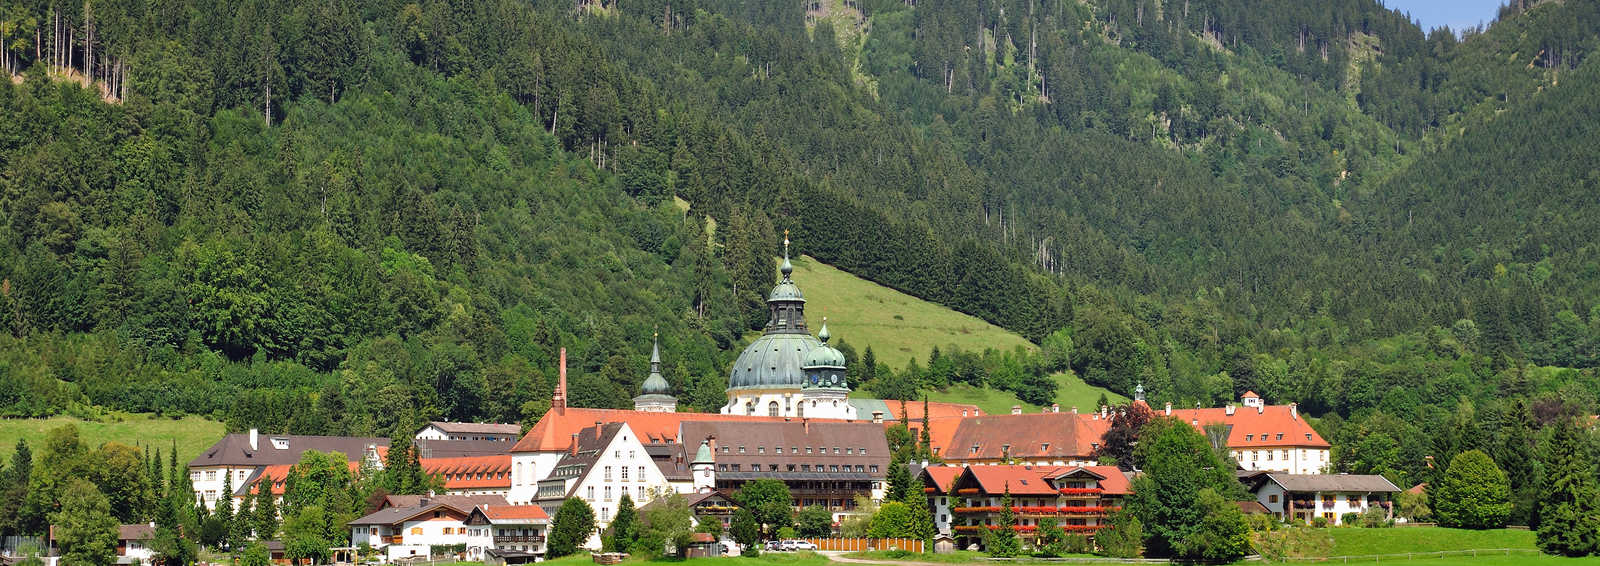 Ettal Monastery, Upper Bavaria, Germany